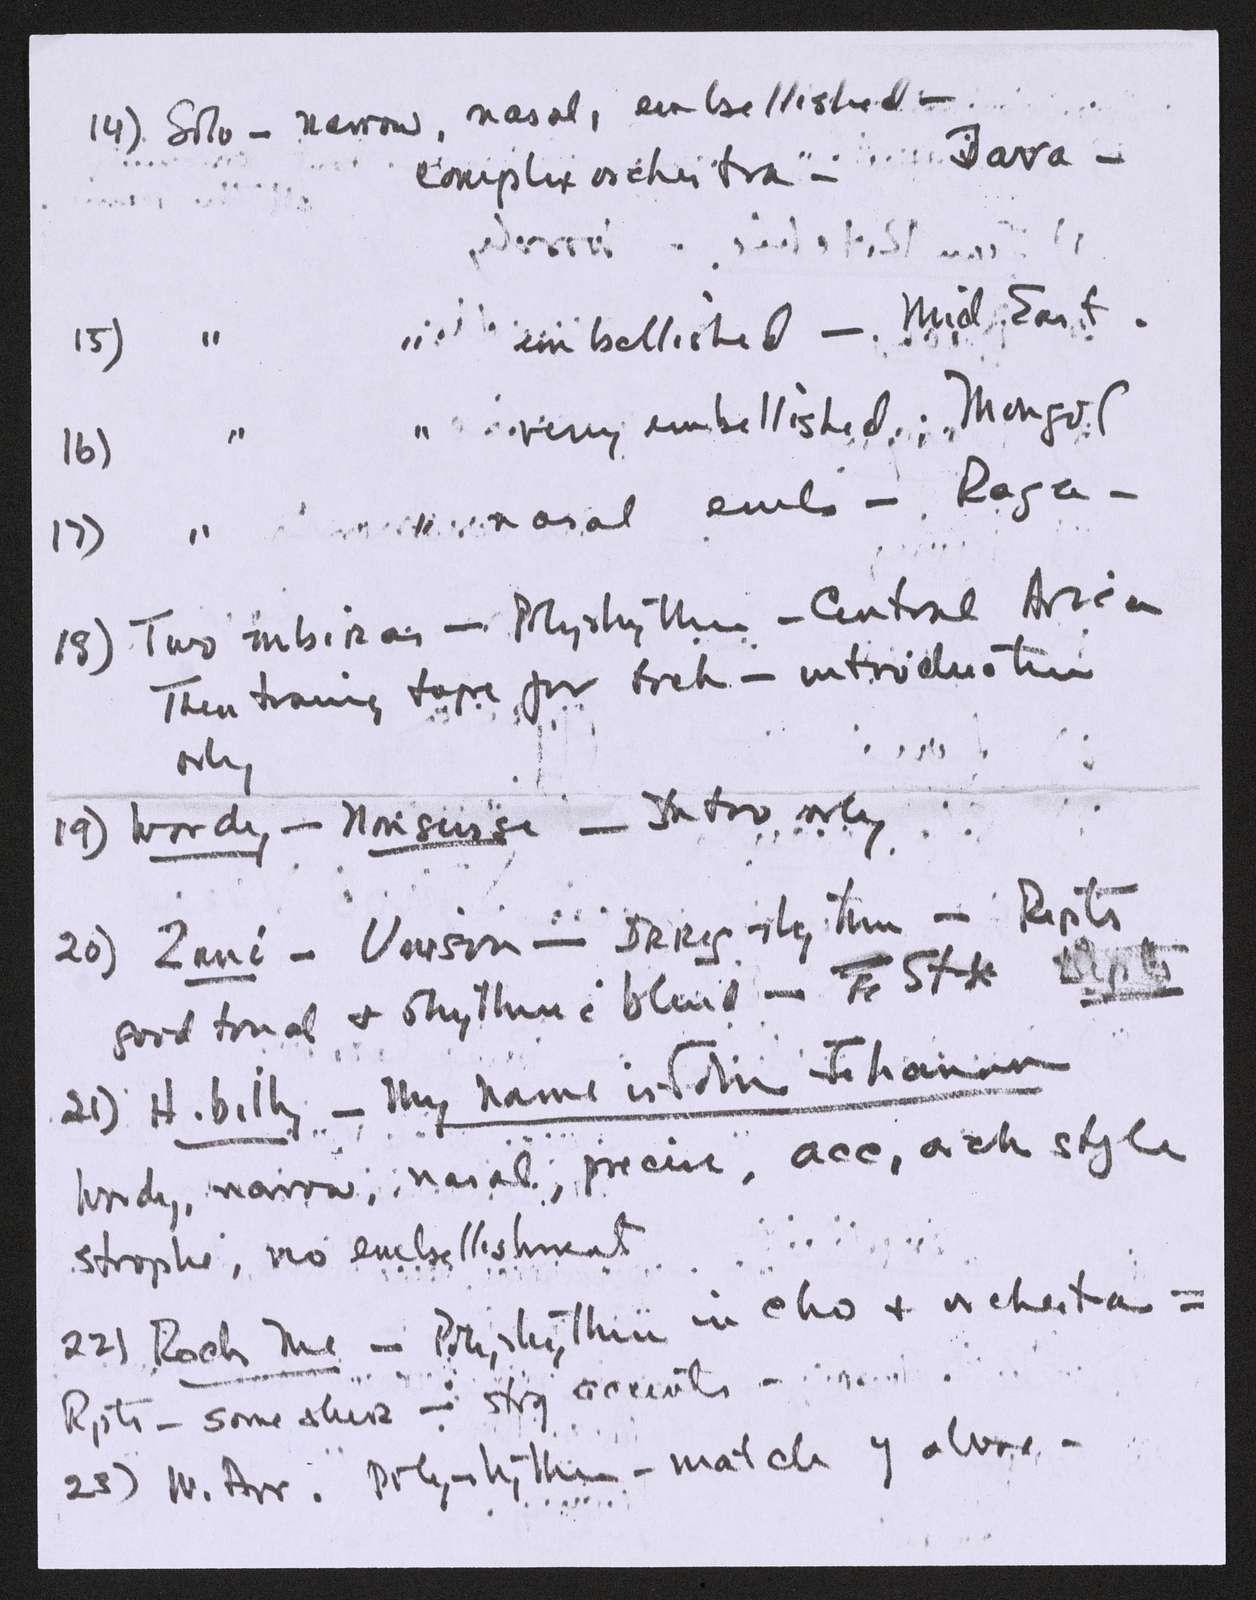 Alan Lomax Collection, Manuscripts, T9160-9189